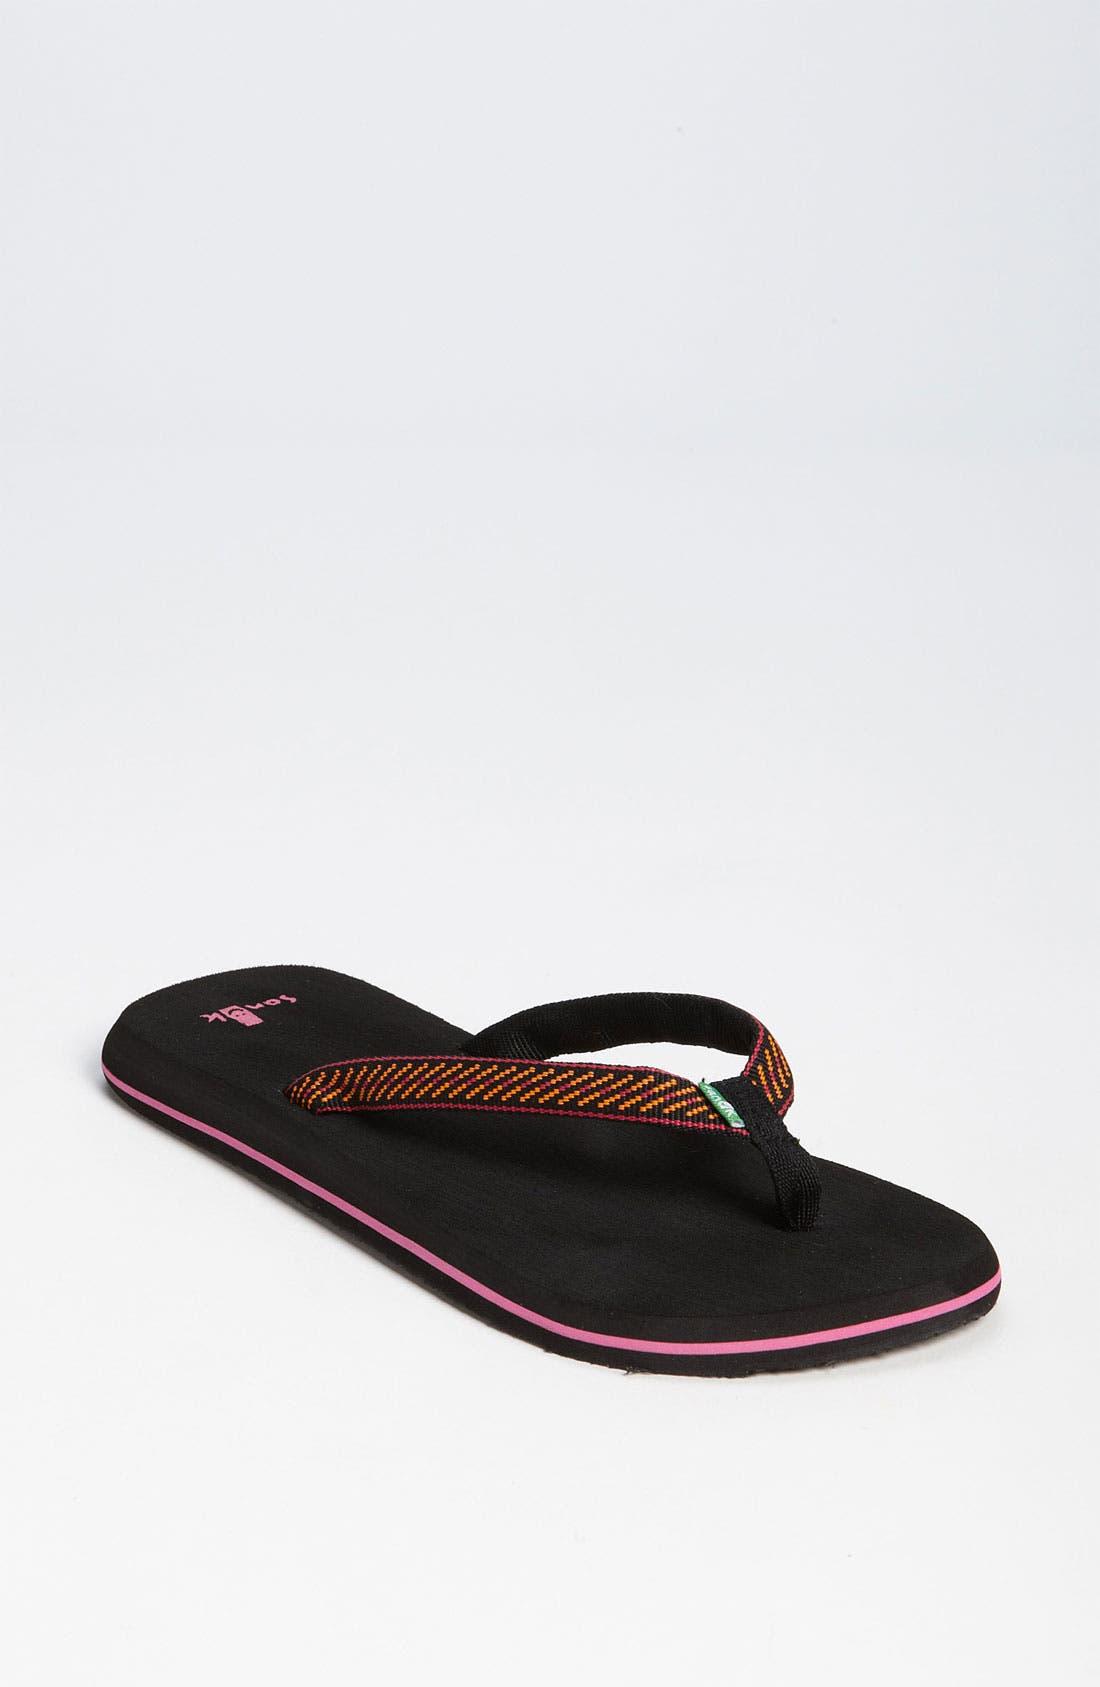 Alternate Image 1 Selected - Sanuk 'Sandpiper' Flip Flop